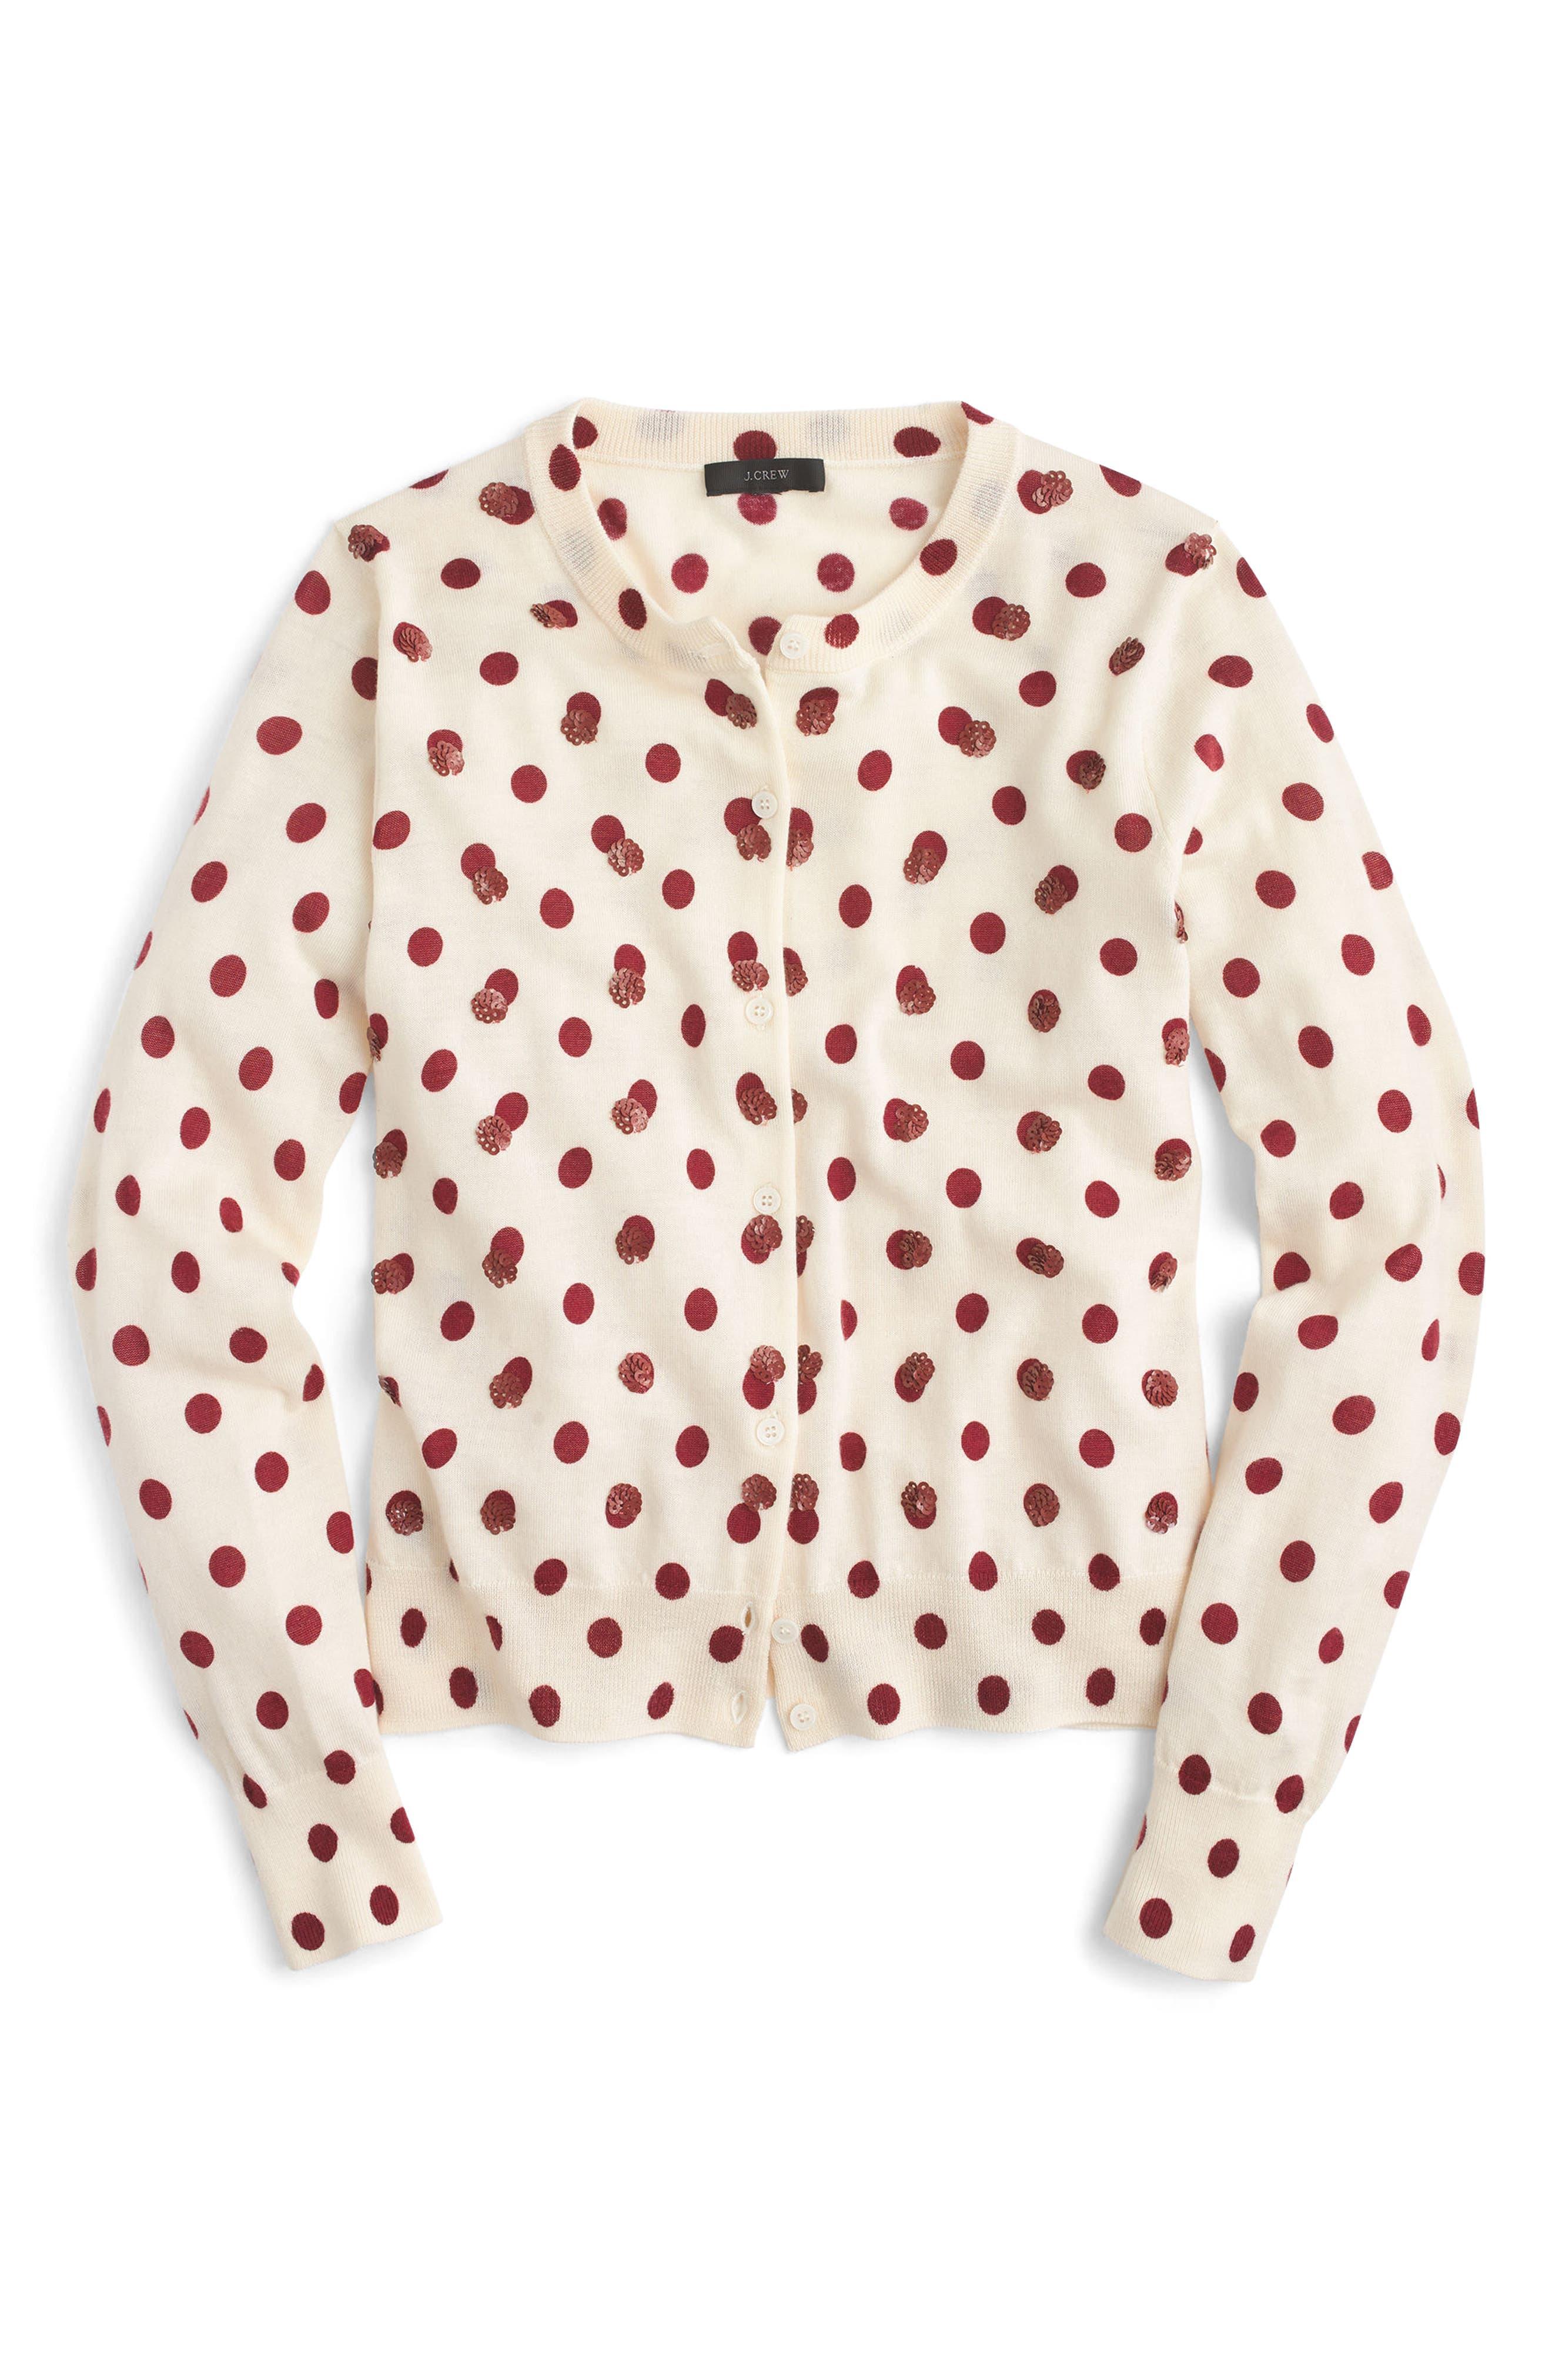 Sequin Polka Dot Cardigan,                             Alternate thumbnail 4, color,                             Dusty Ruby